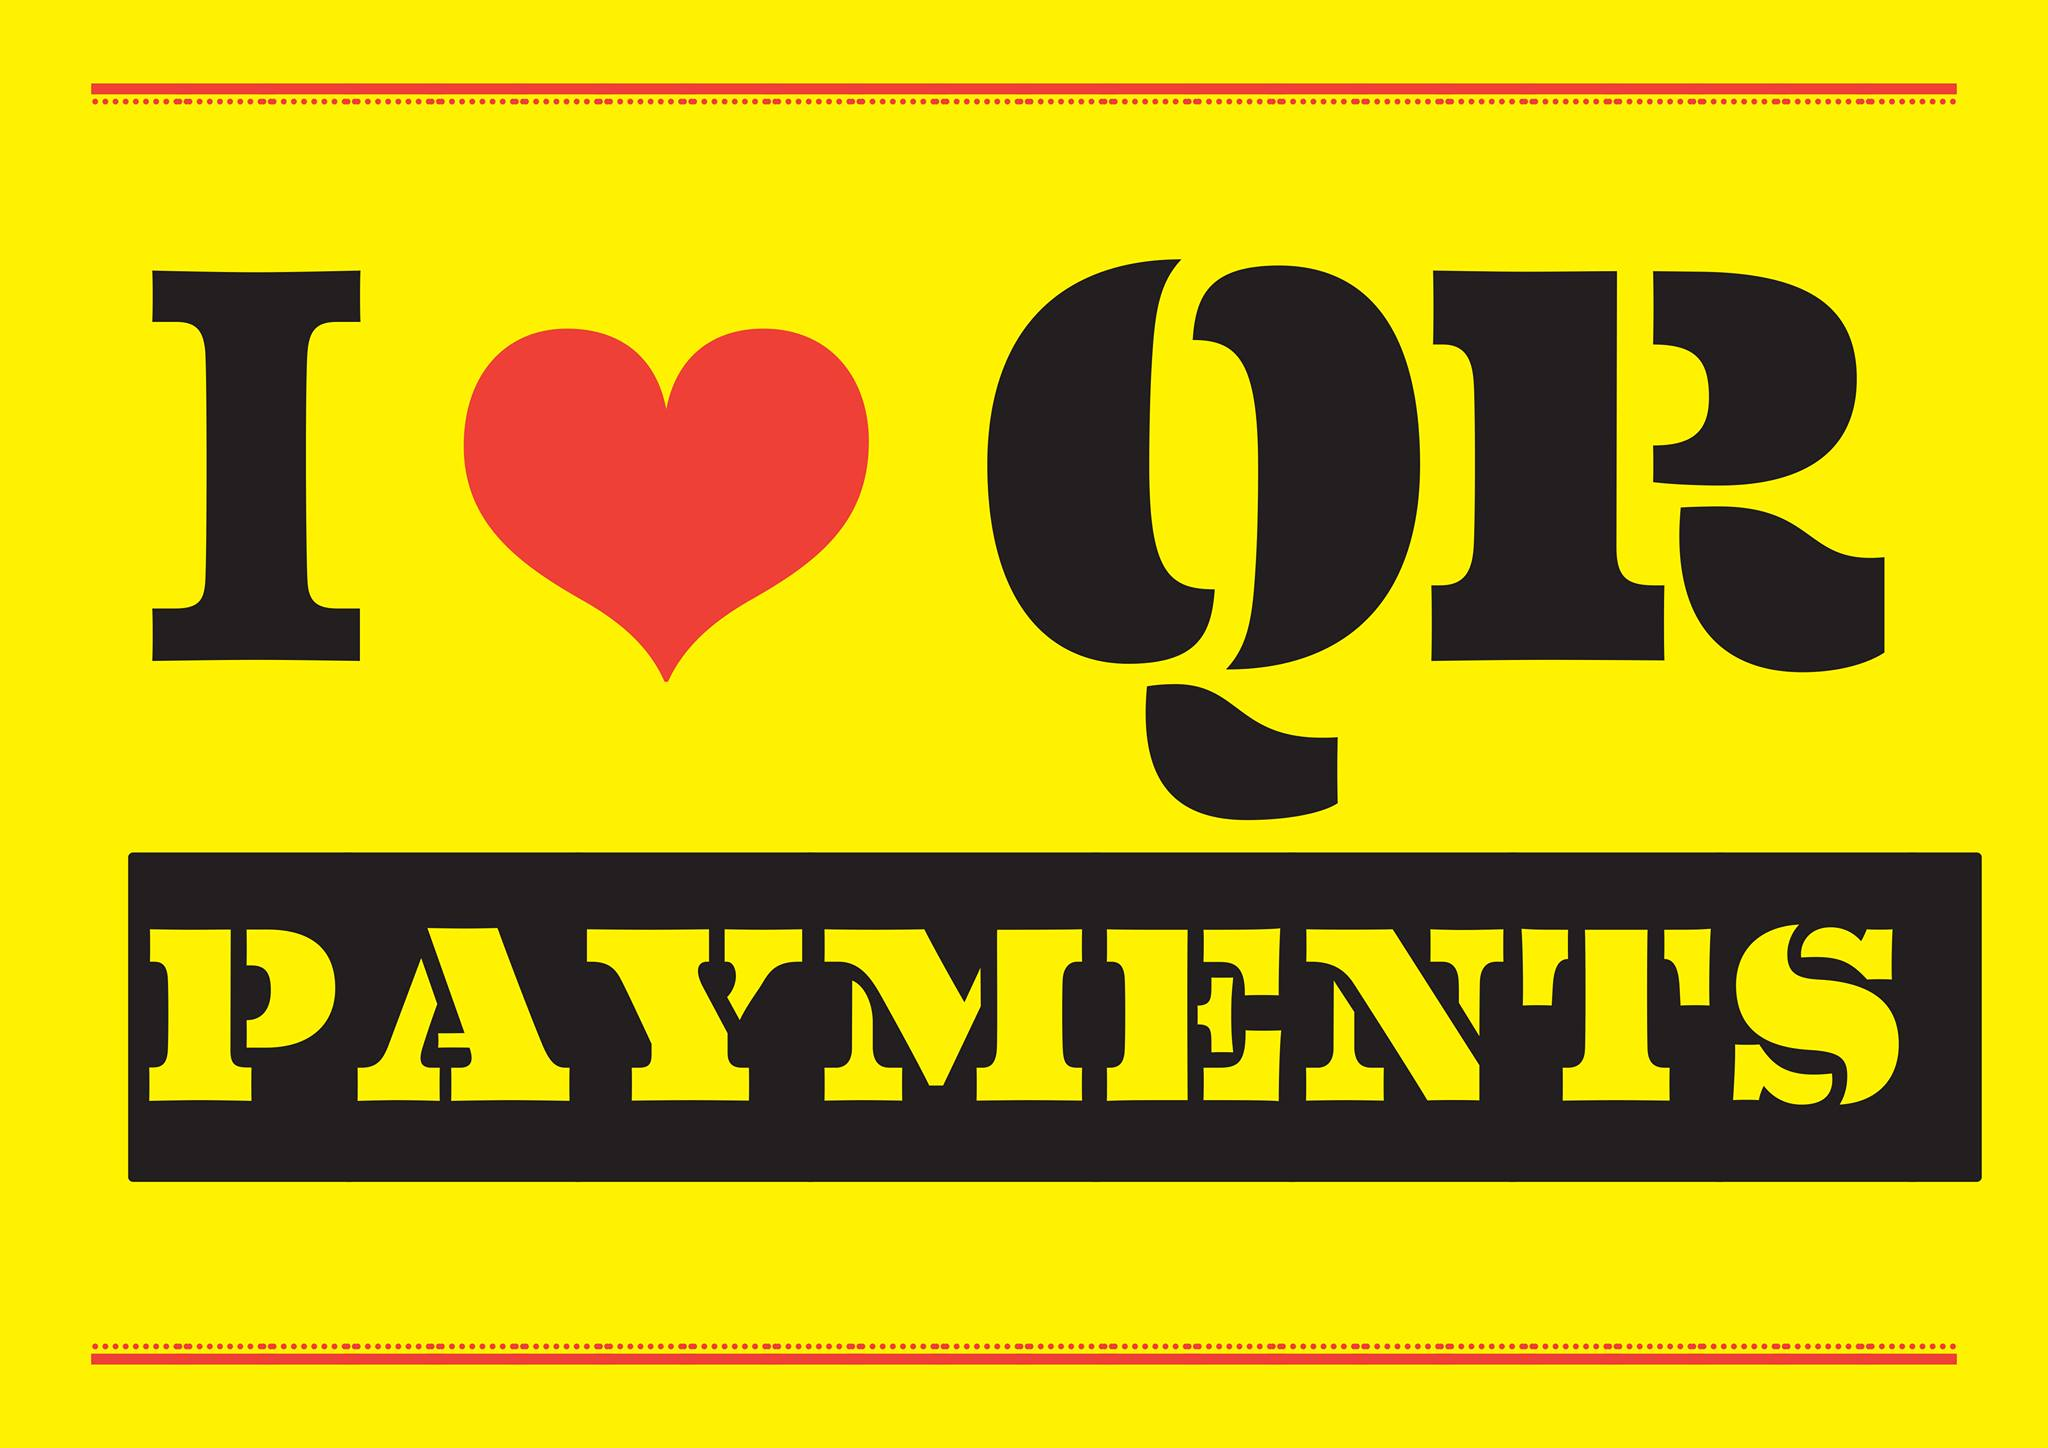 I_love_qr_payments.jpg